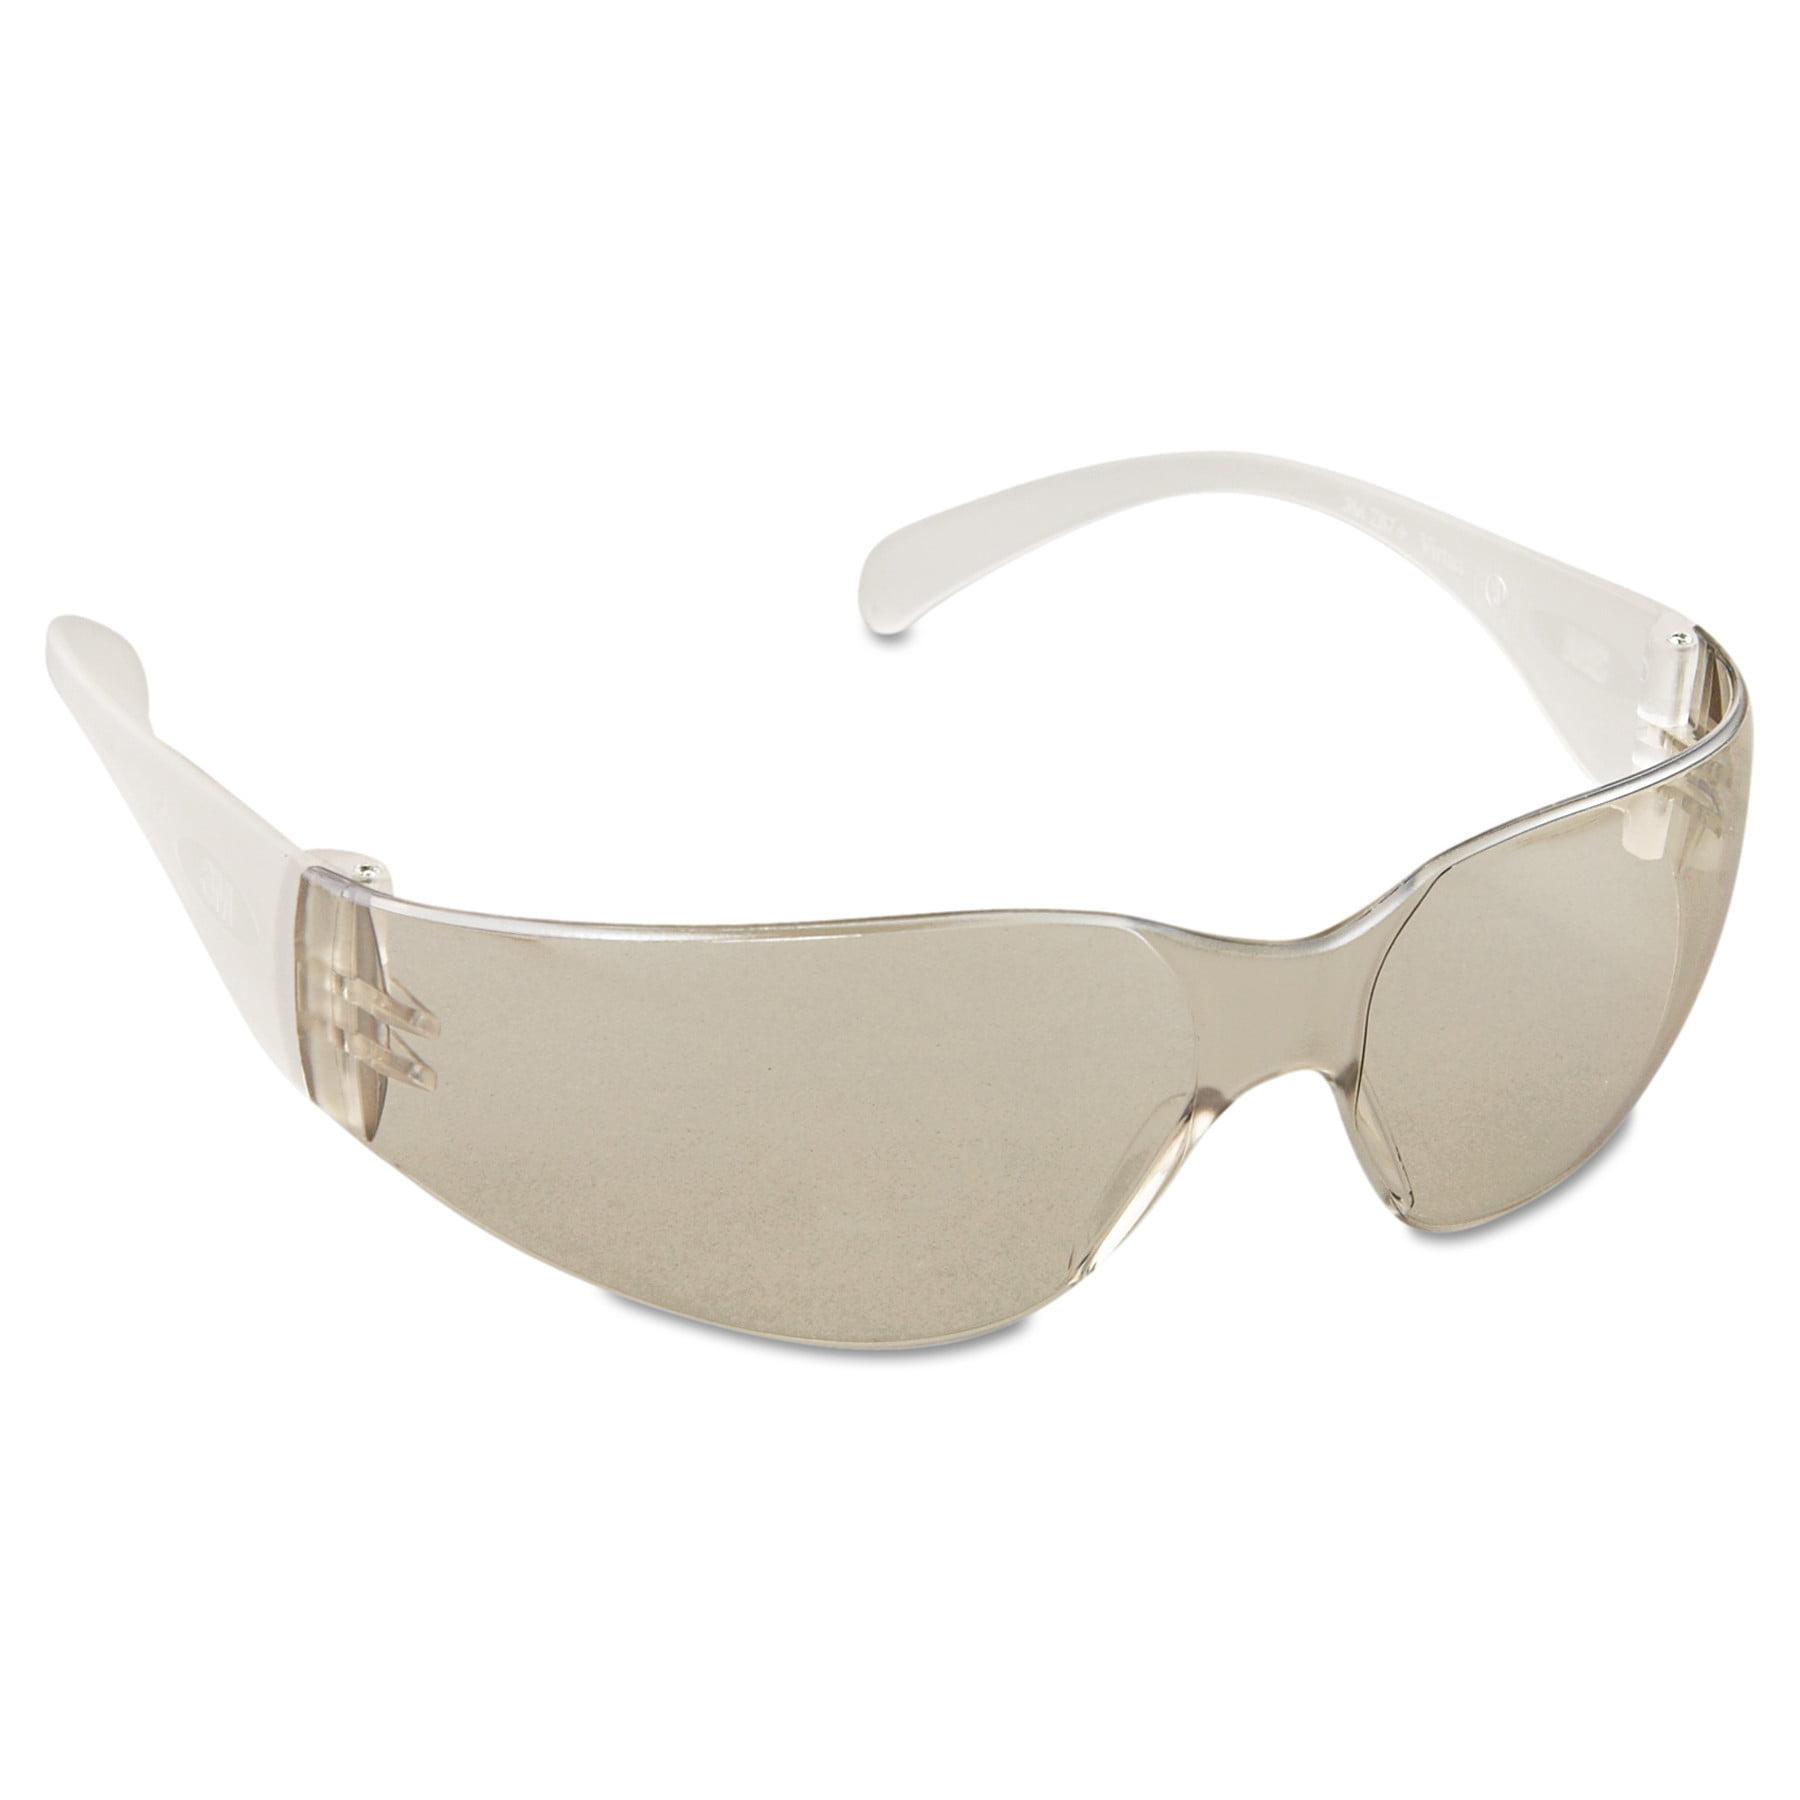 3M Virtua Protective Eyewear, Clear Frame, Mirror Indoor/Outdoor Lens